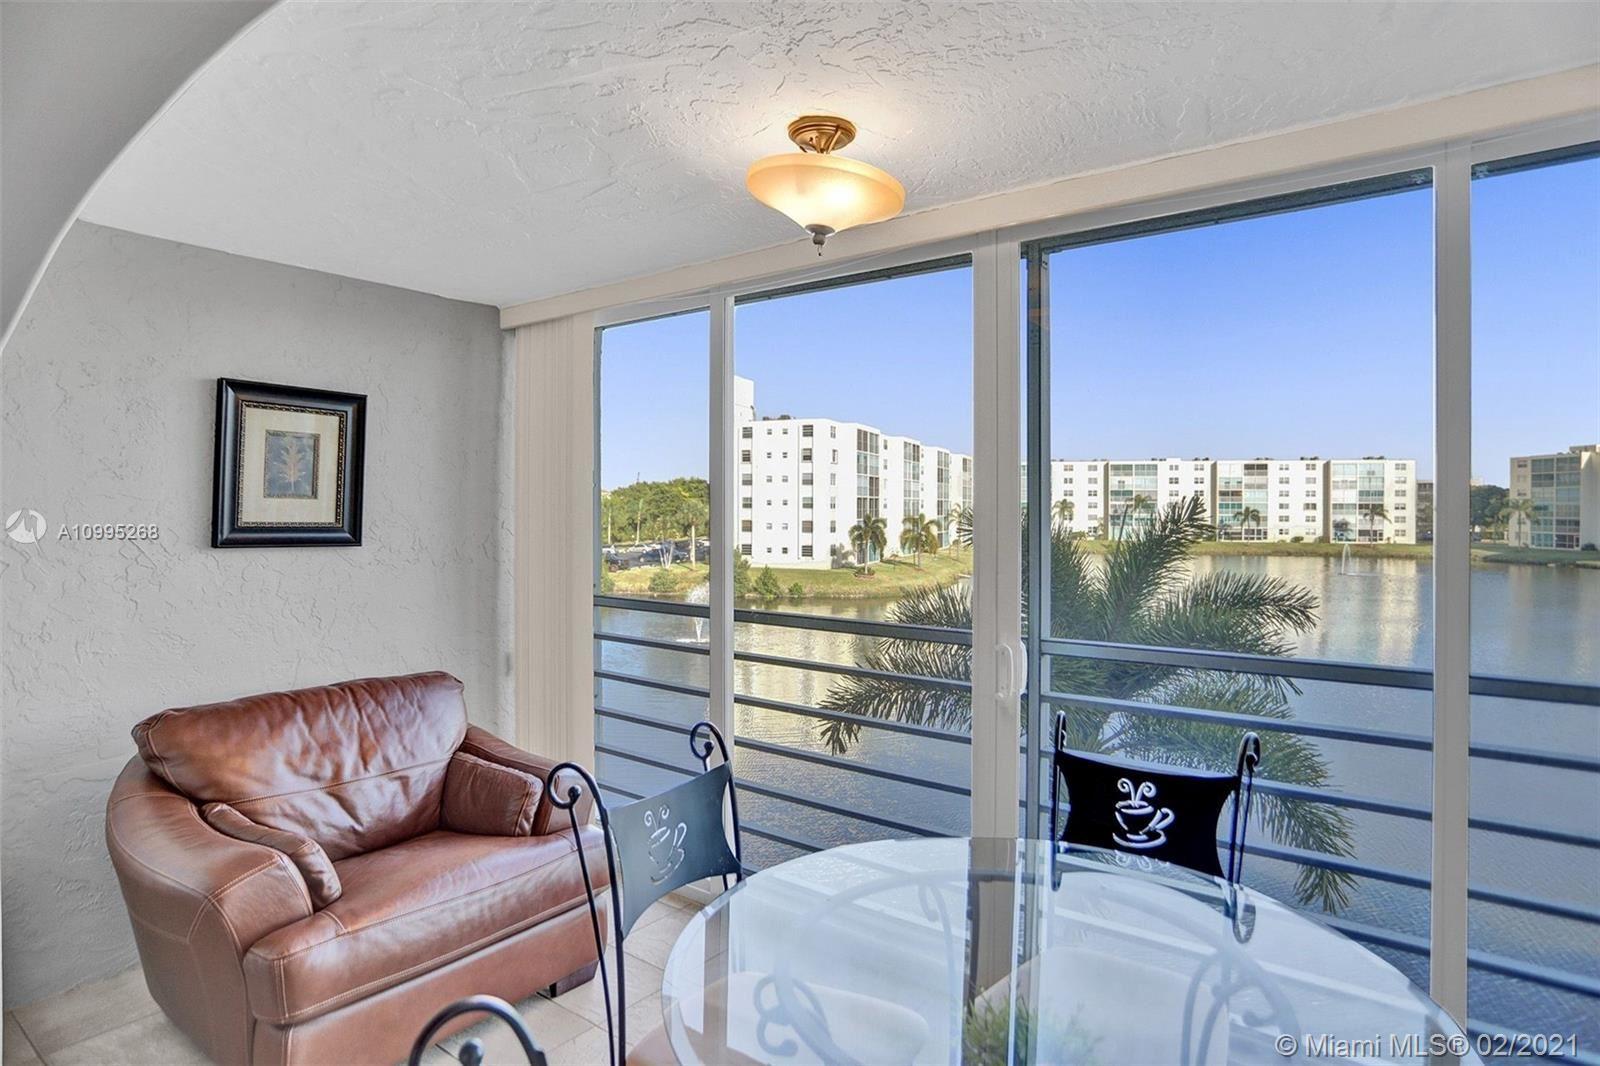 Photo of 101 SE 3rd Ave #306, Dania Beach, FL 33004 (MLS # A10995268)